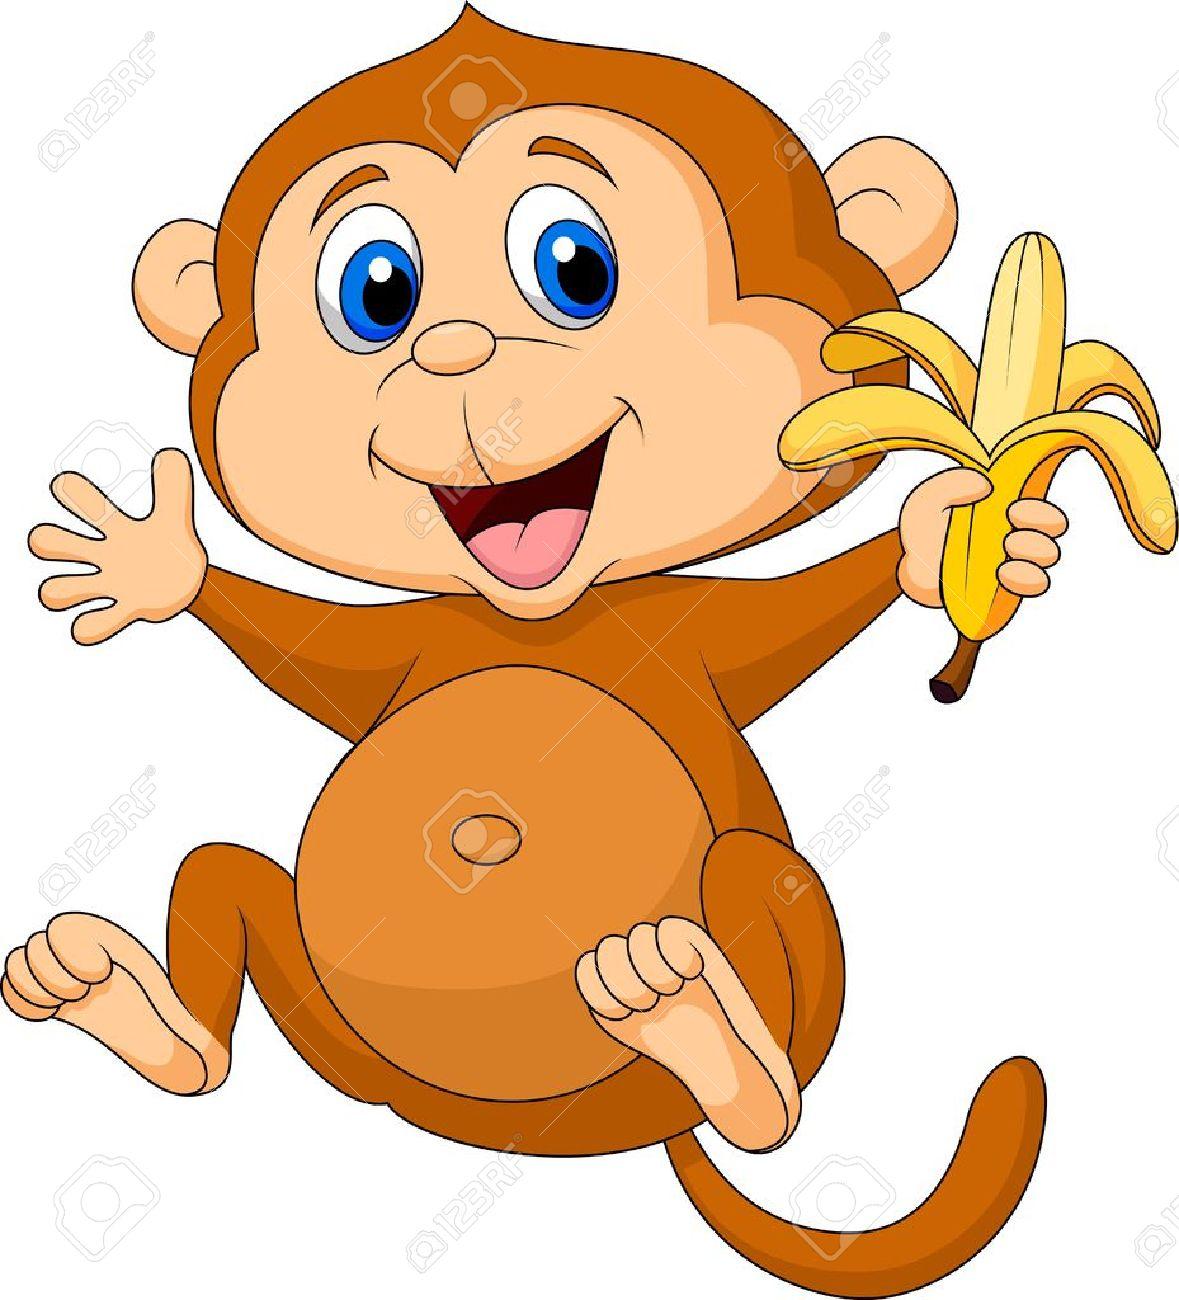 Cute monkey cartoon eating banana Stock Vector - 19119545